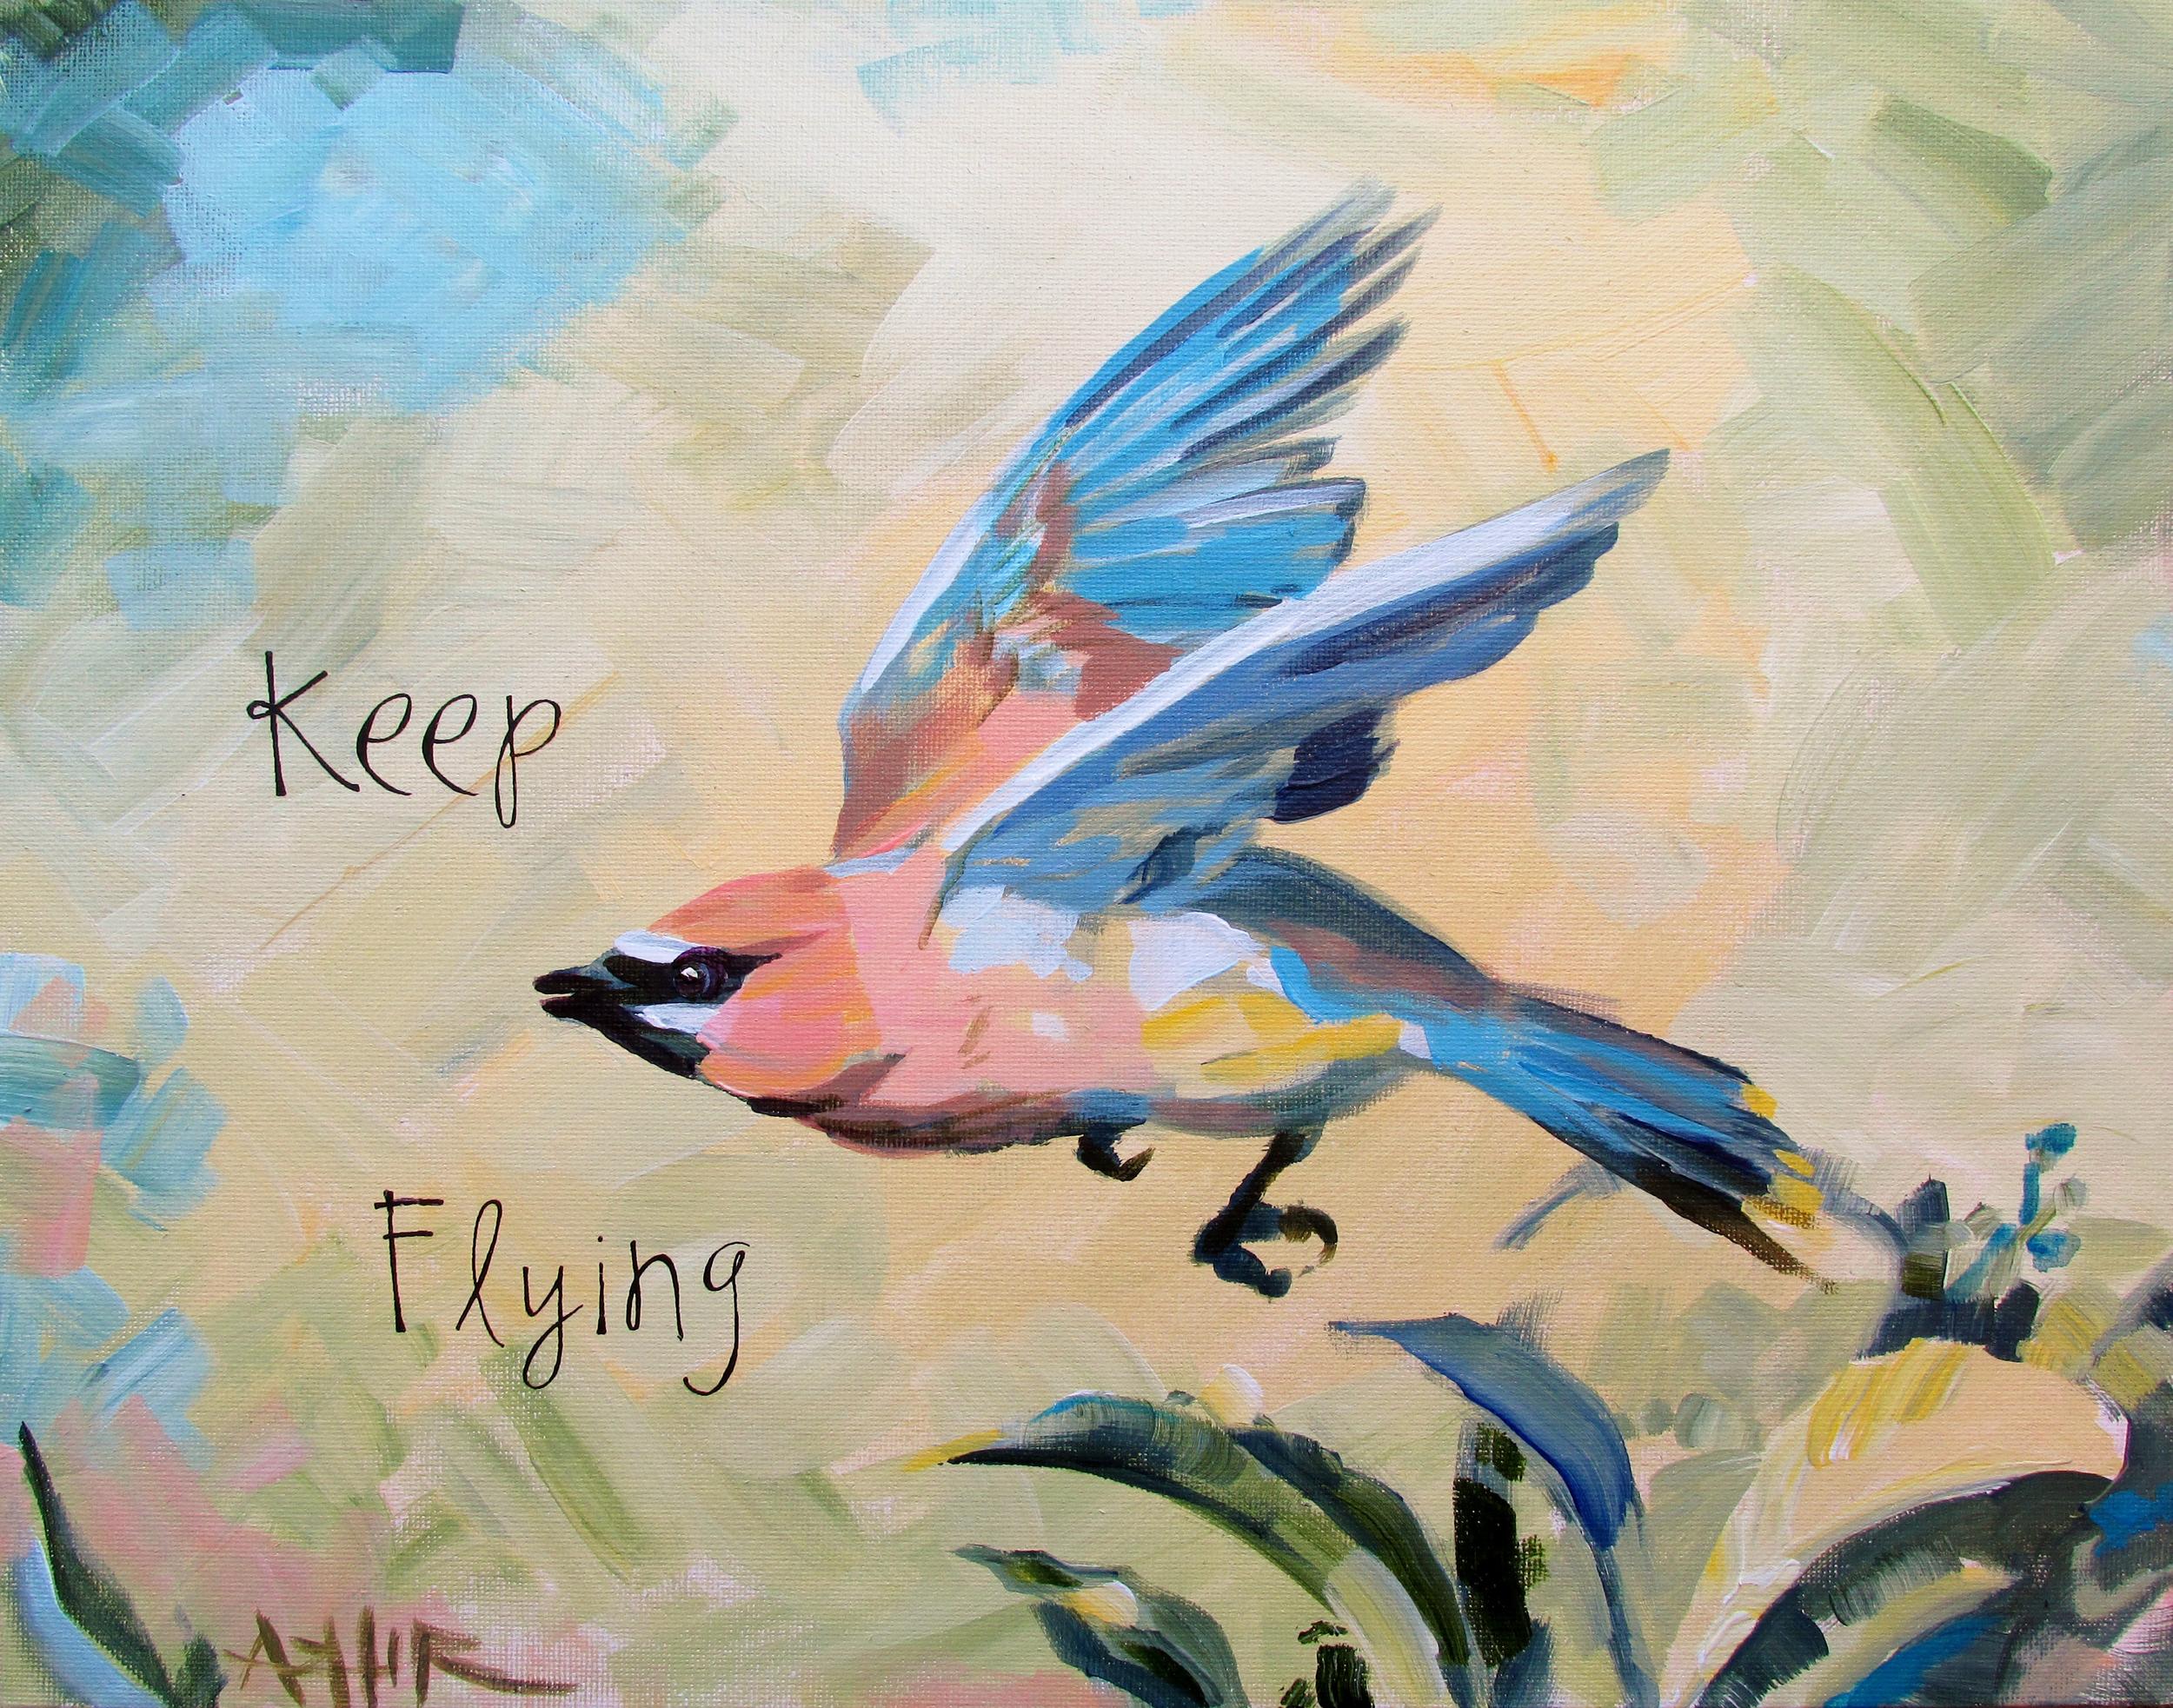 "SOLD, Keep Flying, Copyright 2015 Hirschten, Acrylic on Canvas 11"" x 14"""